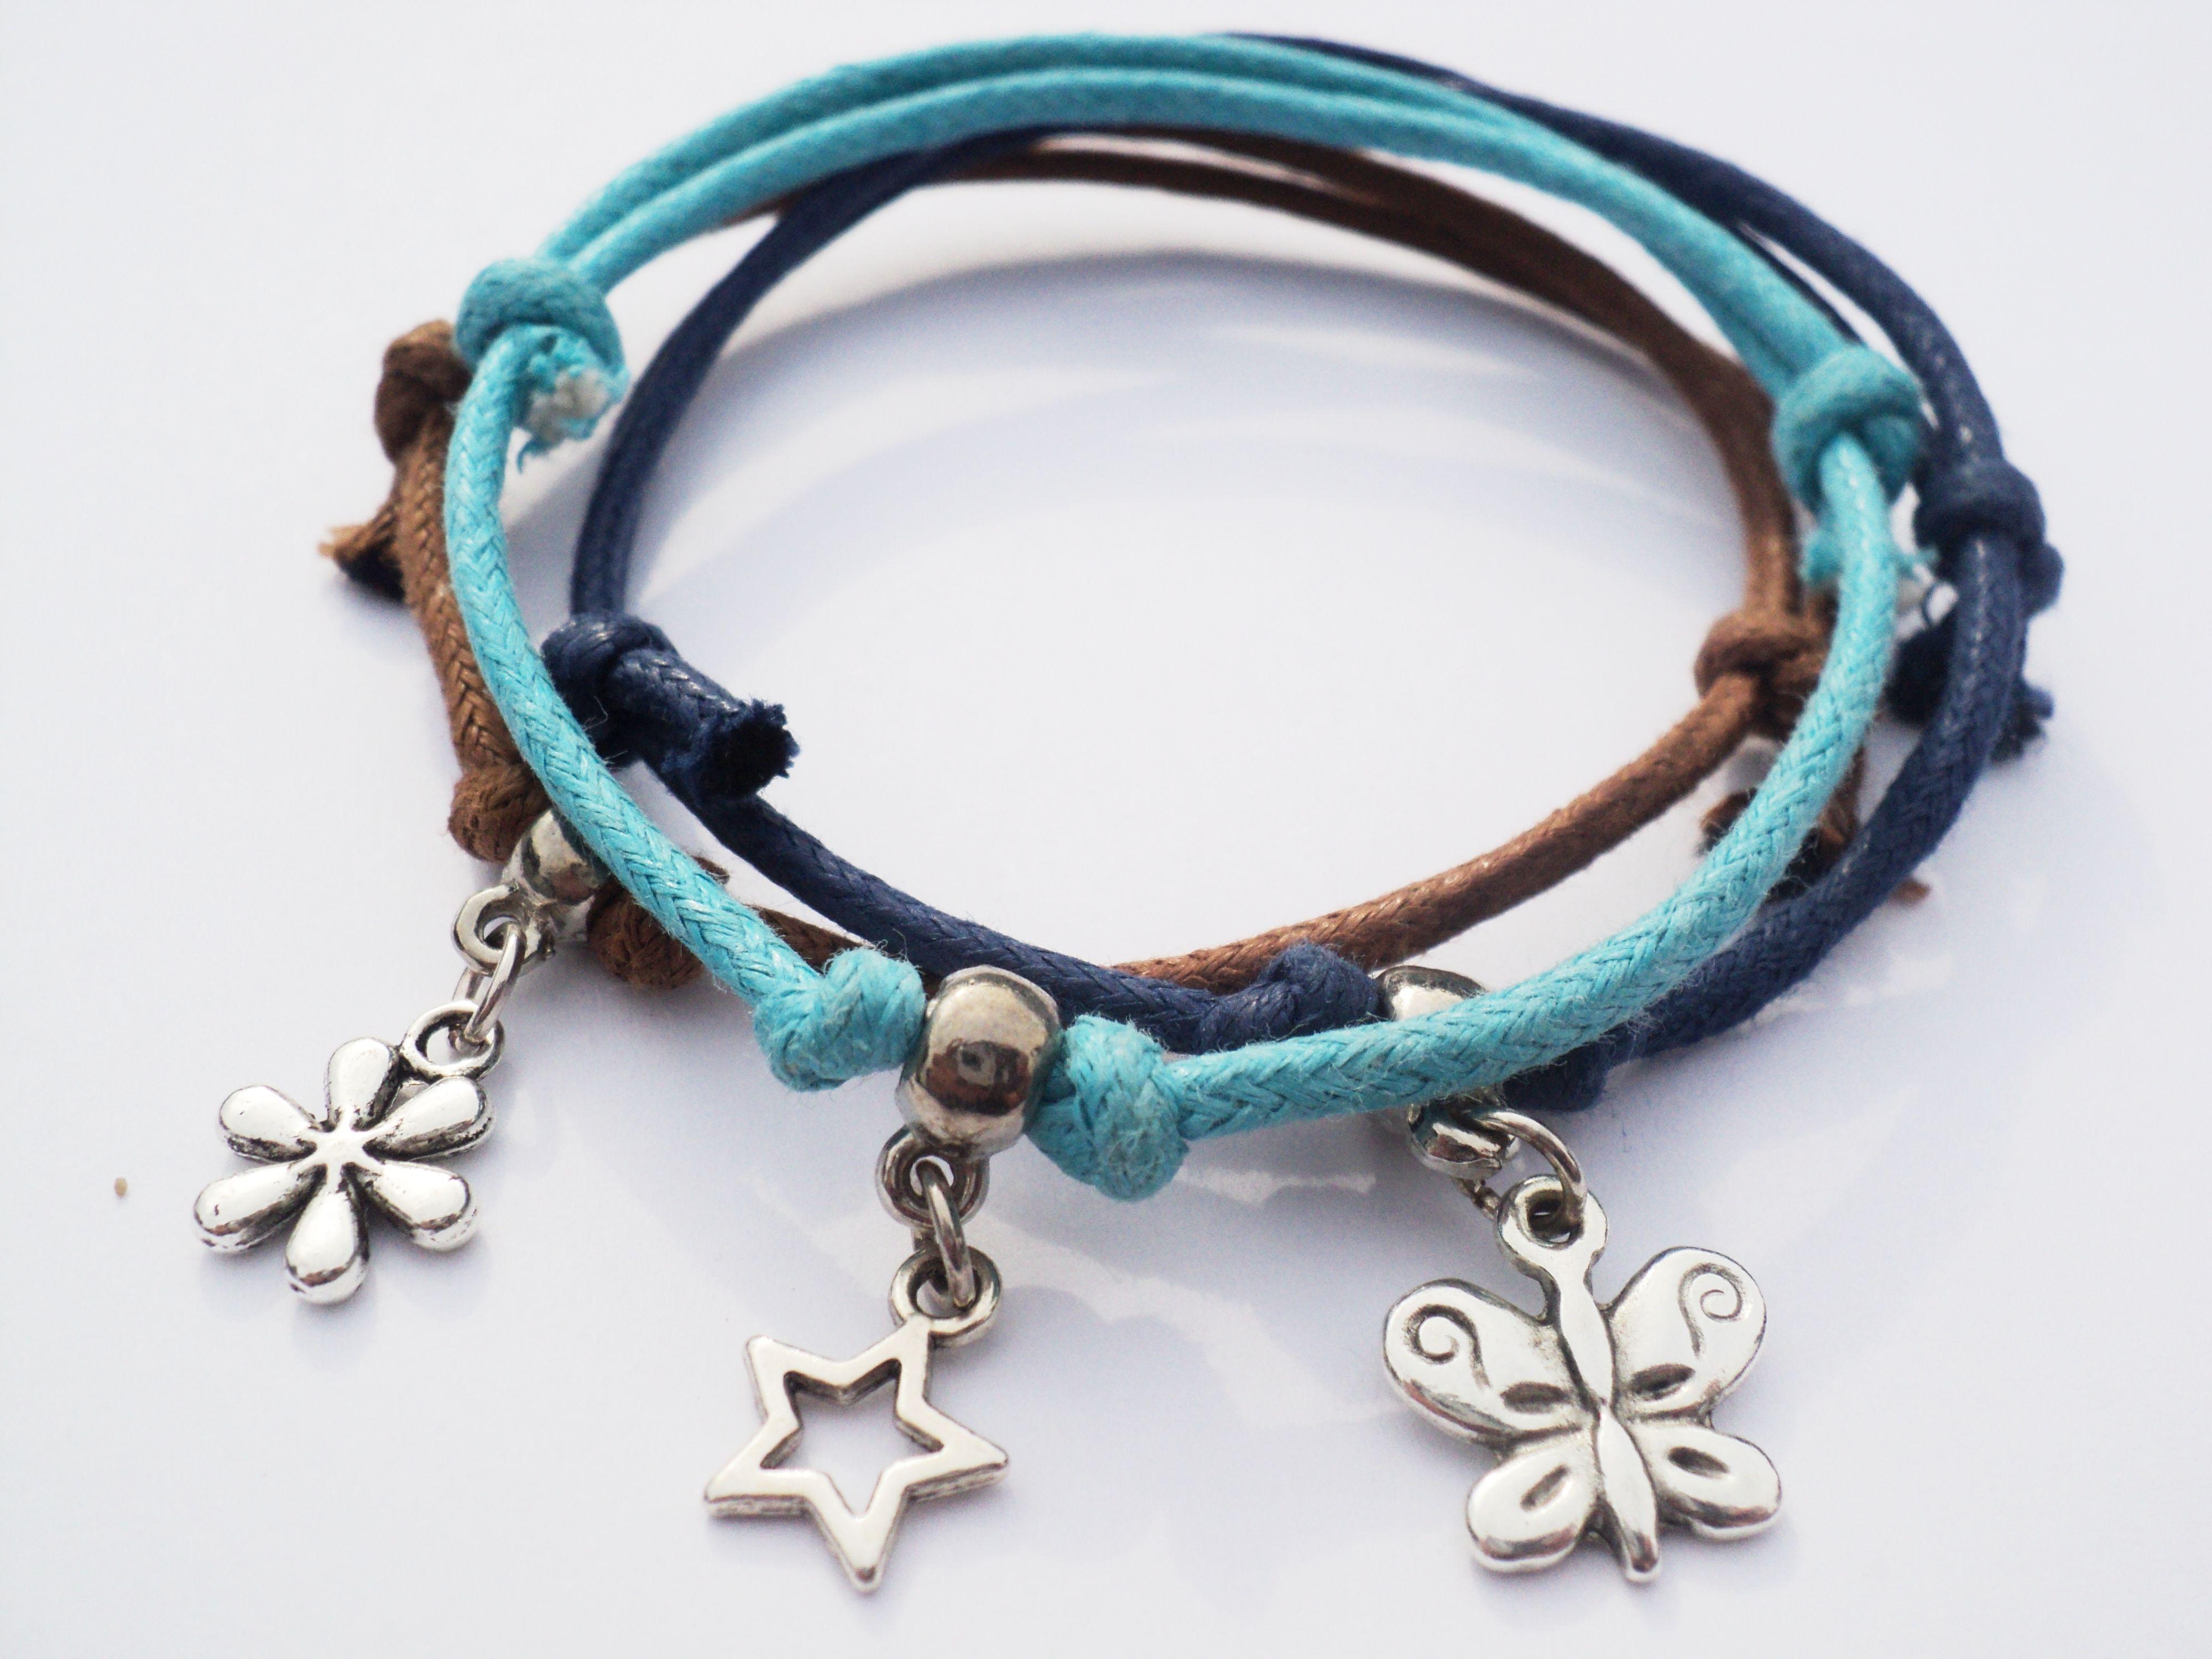 Friendship Bracelet Kit, £6.00